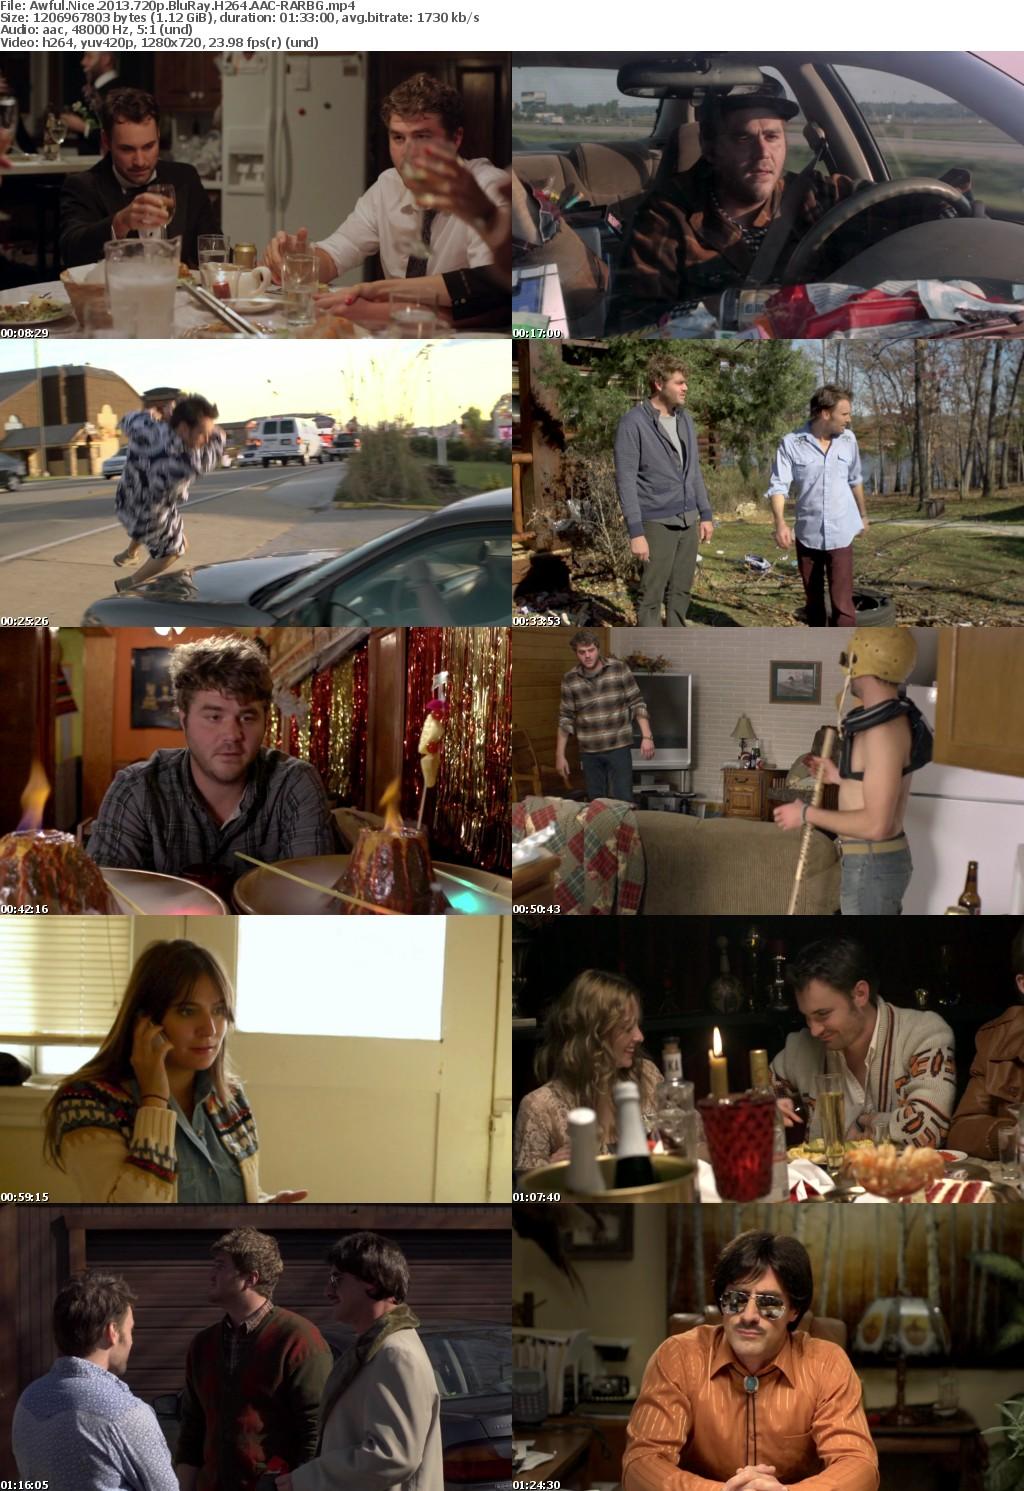 Awful Nice (2013) 720p BluRay H264 AAC-RARBG